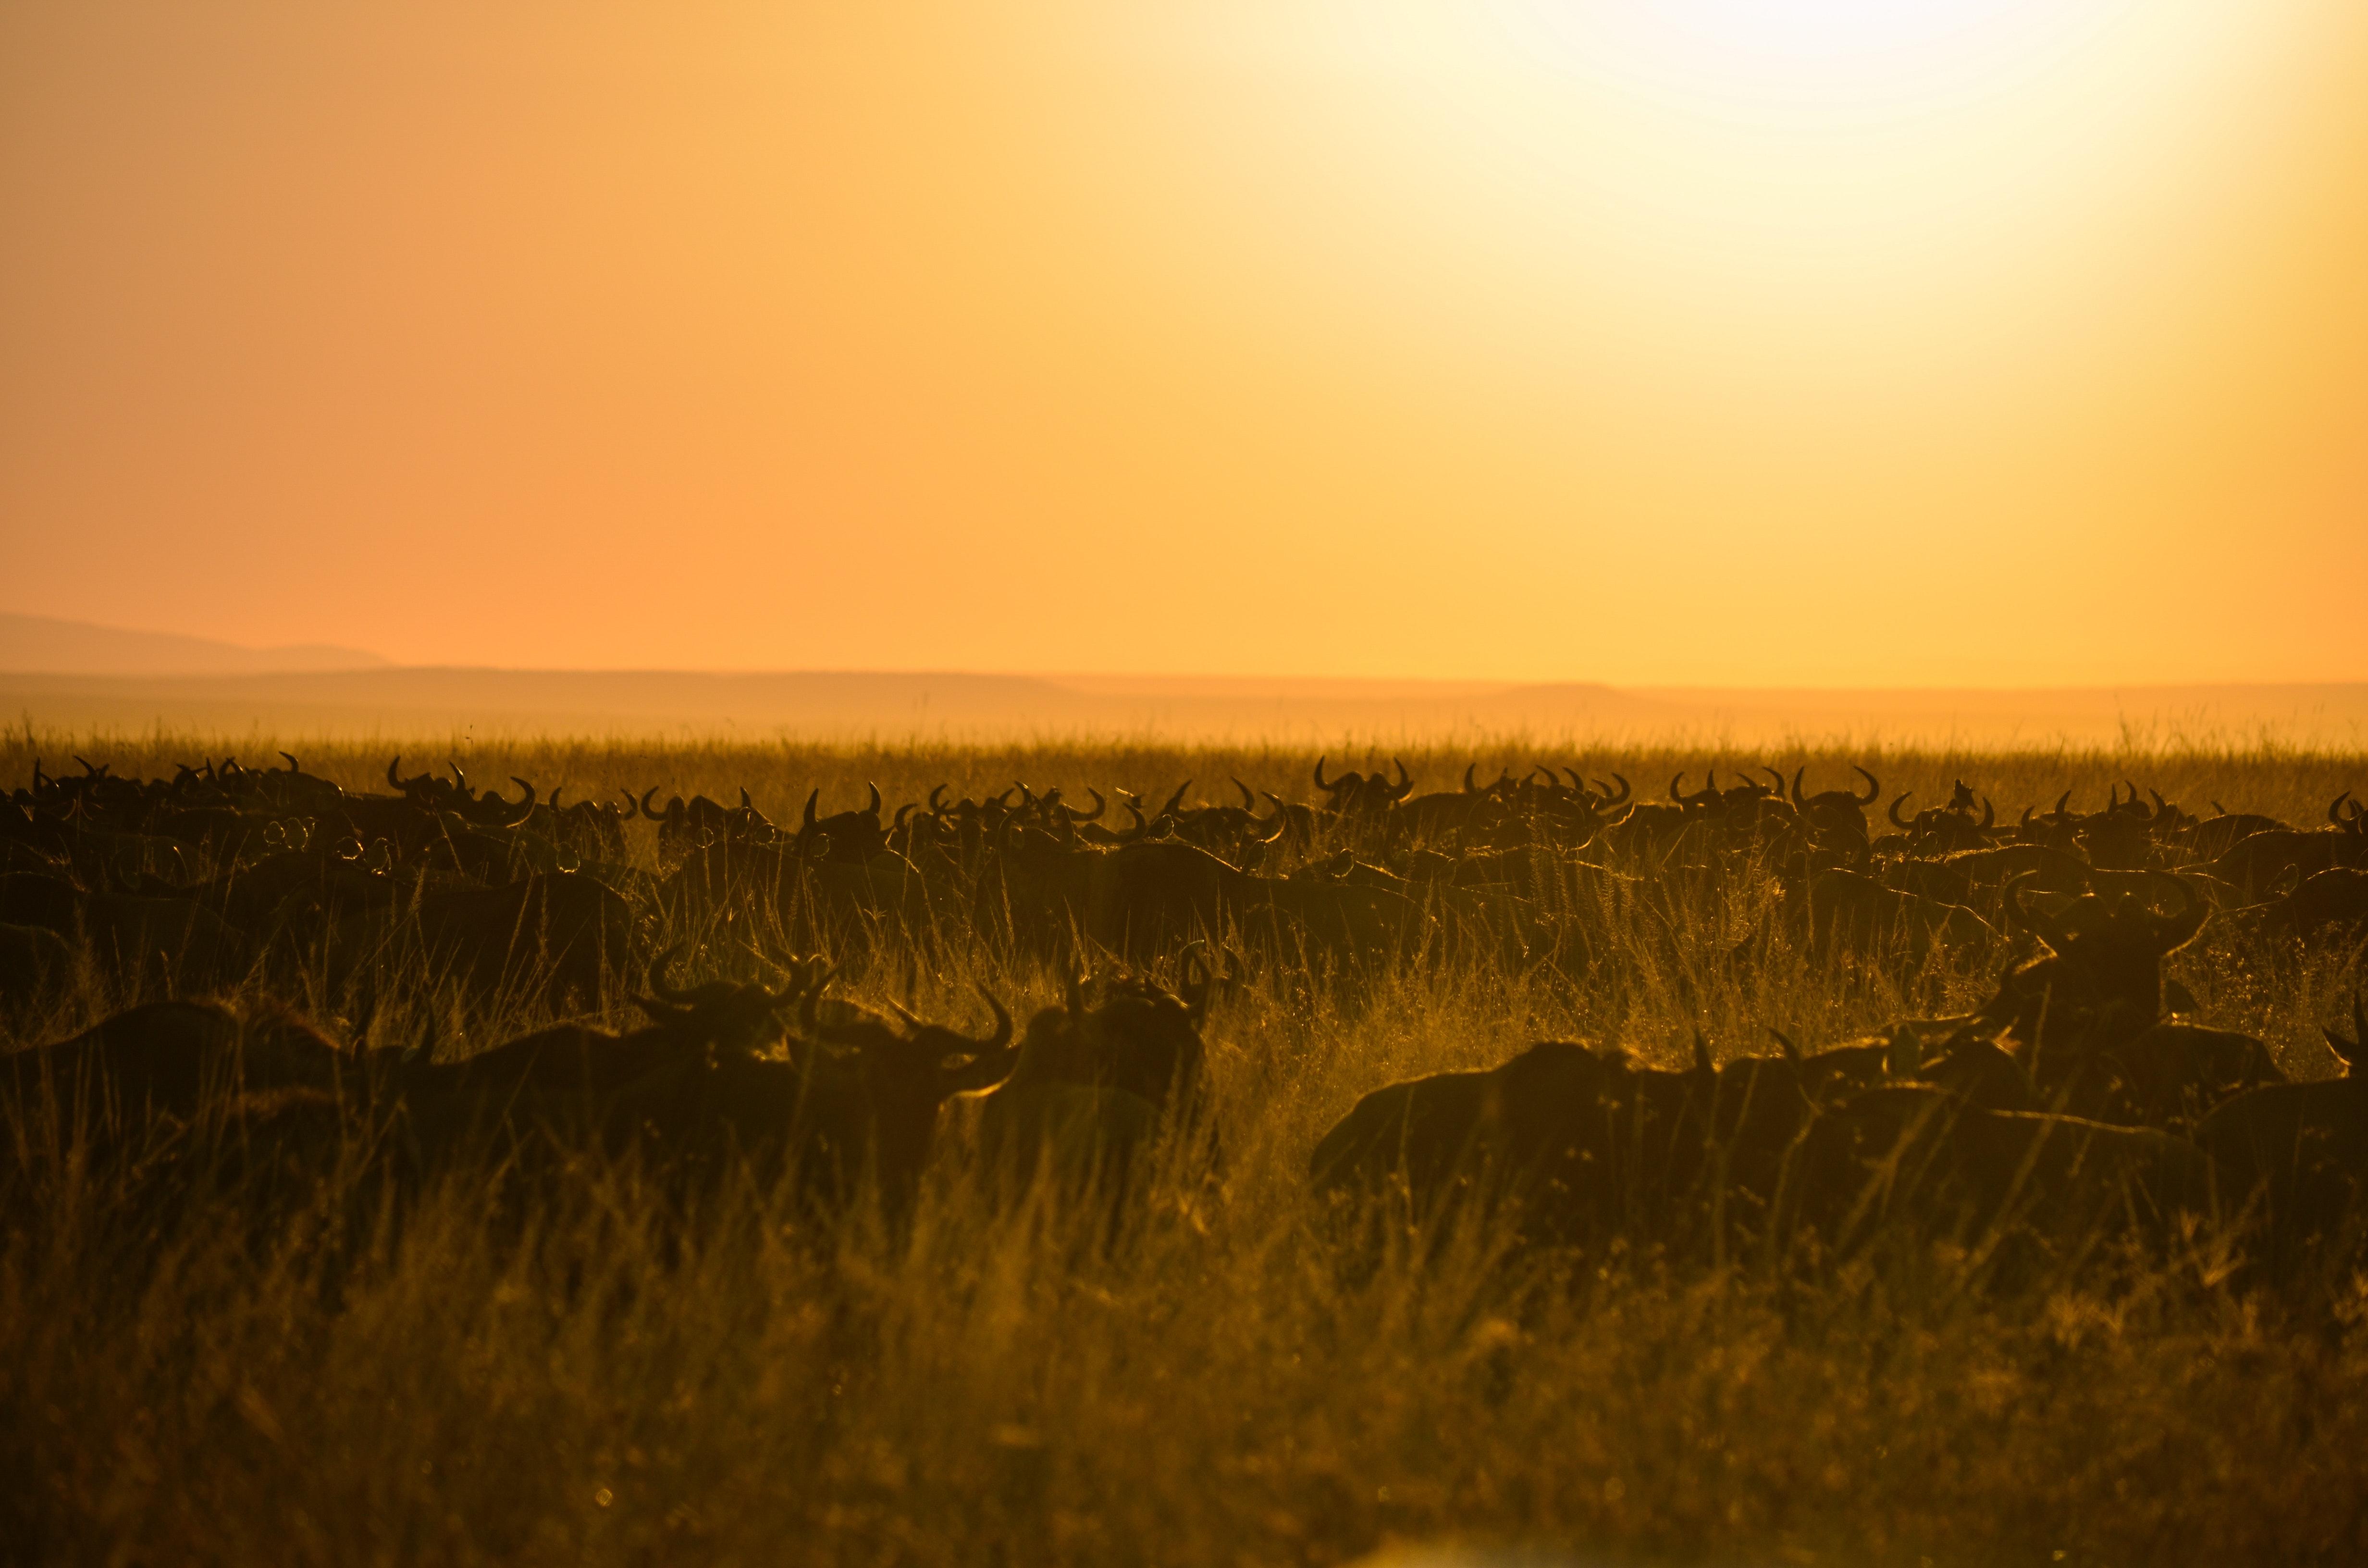 Herd of buffalo during sunset photo